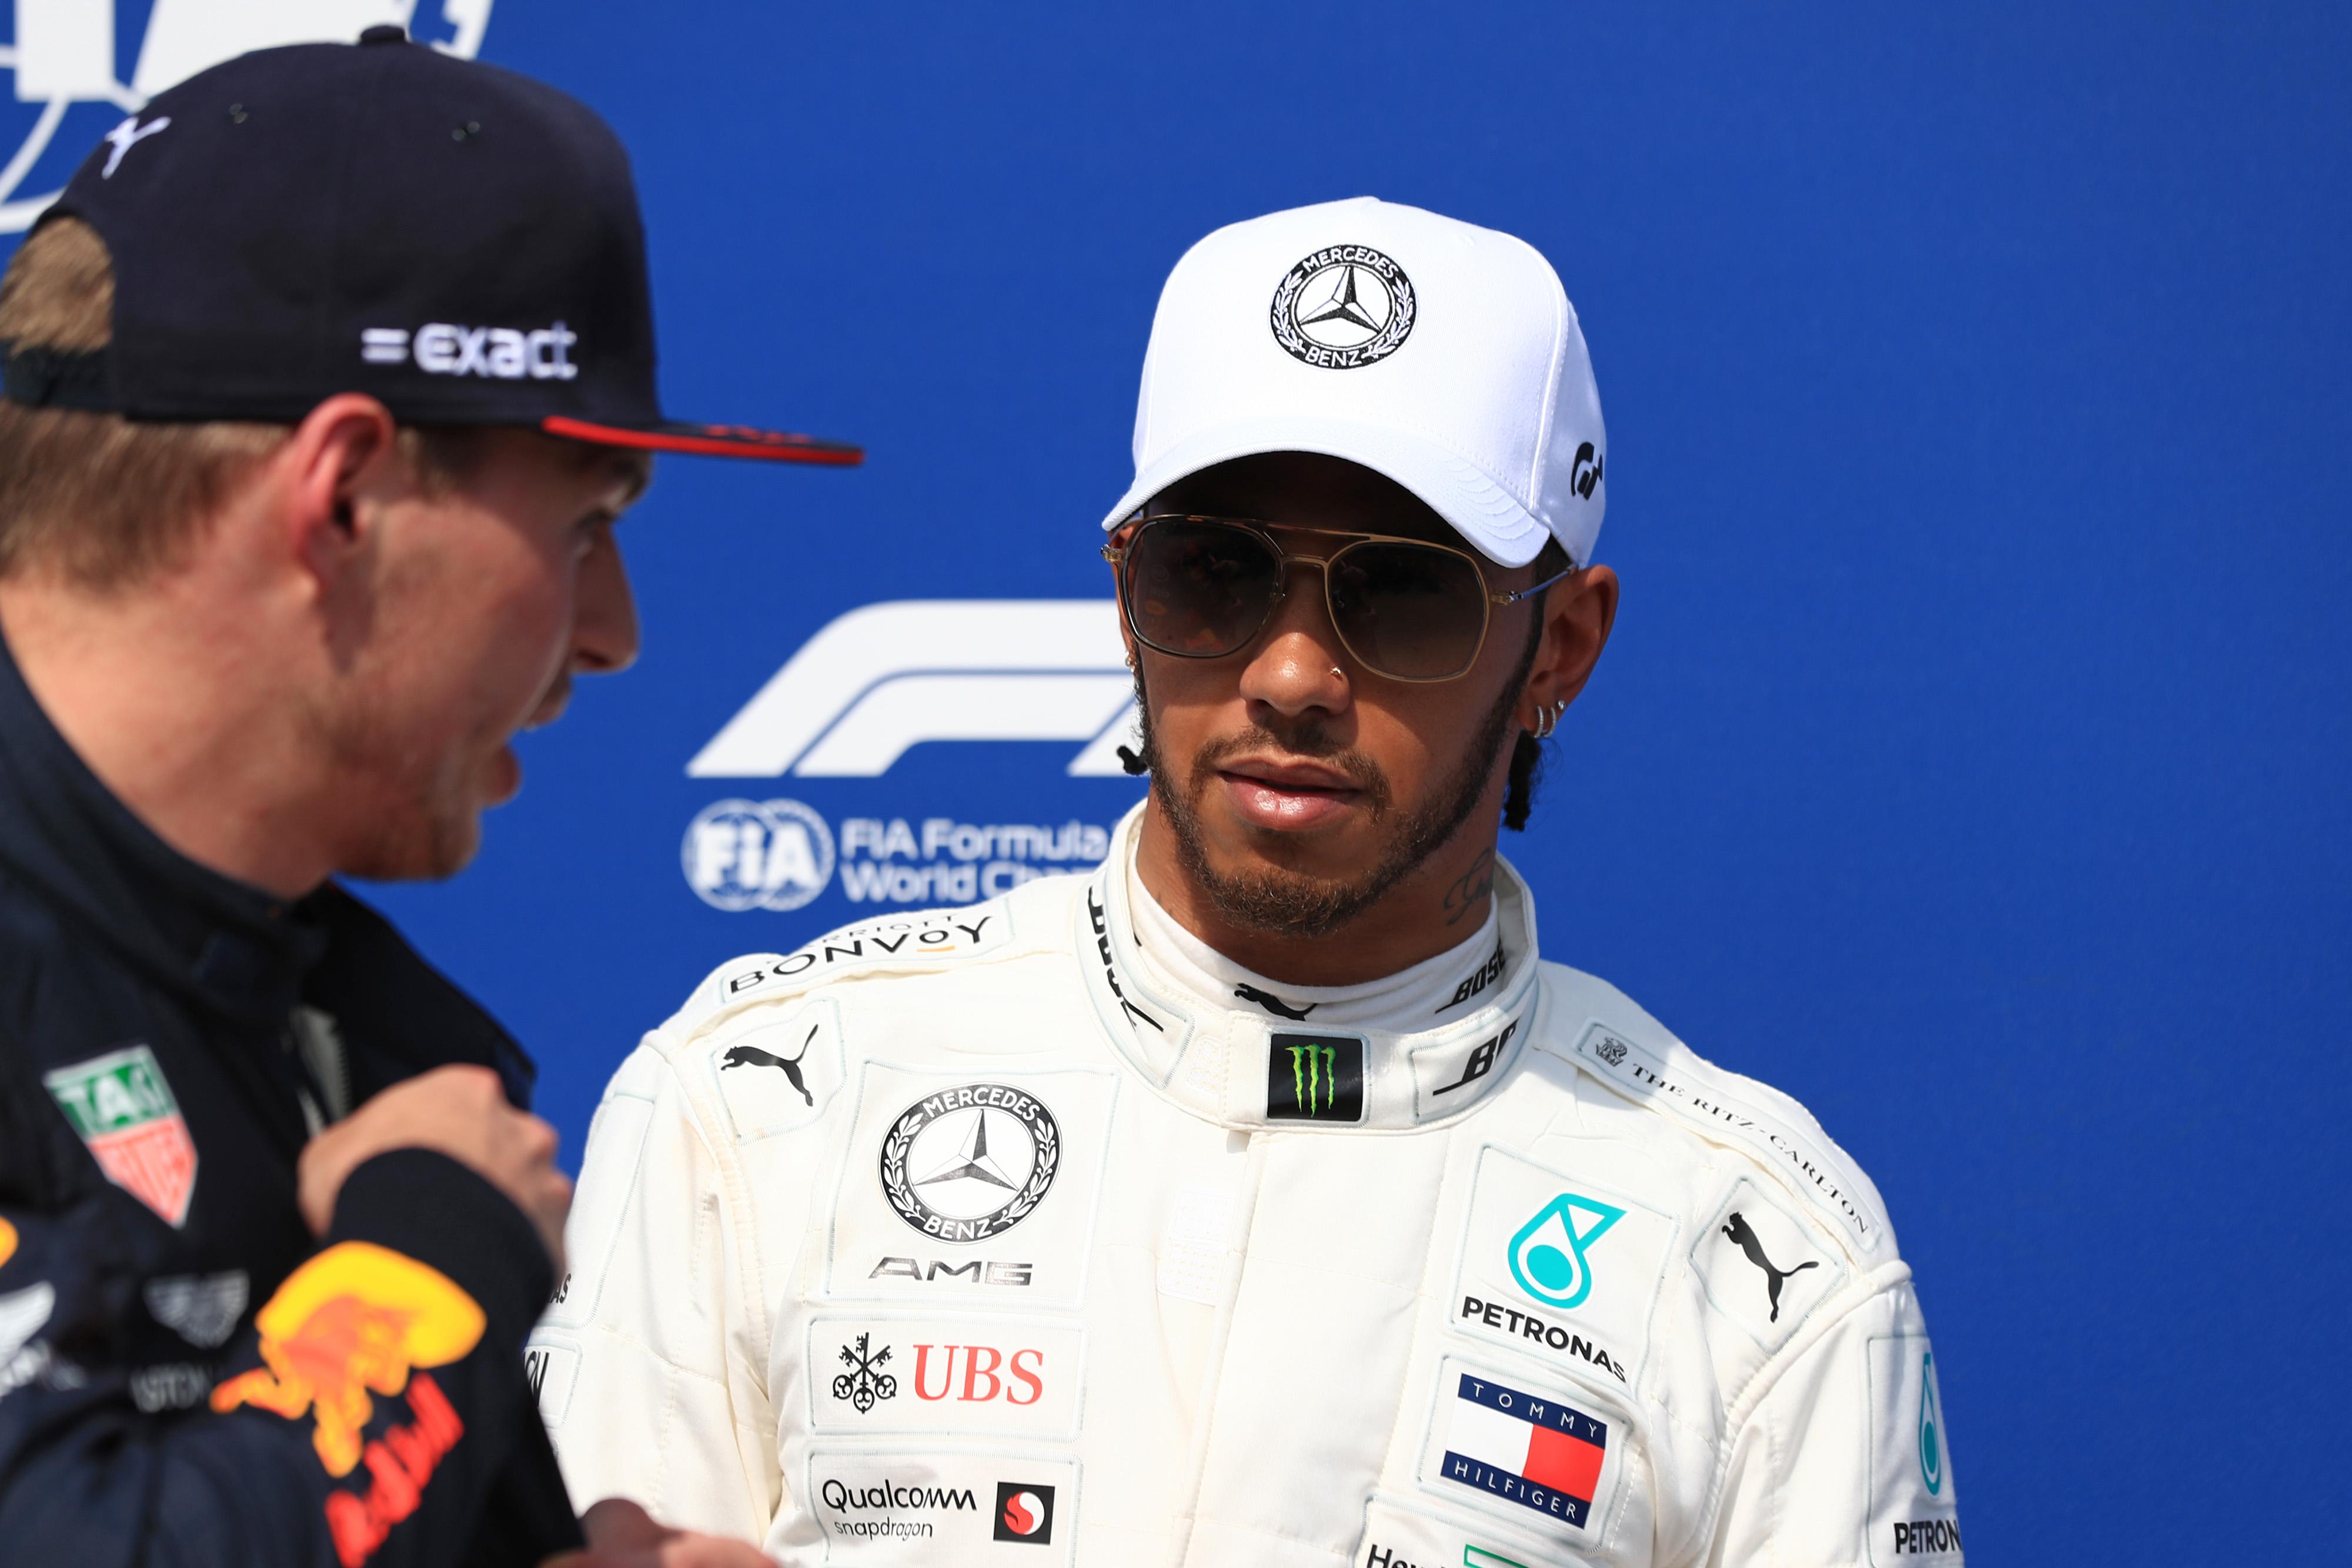 F1 Formula 1 Lewis Hamilton Max Verstappen talking on track sign of weakness